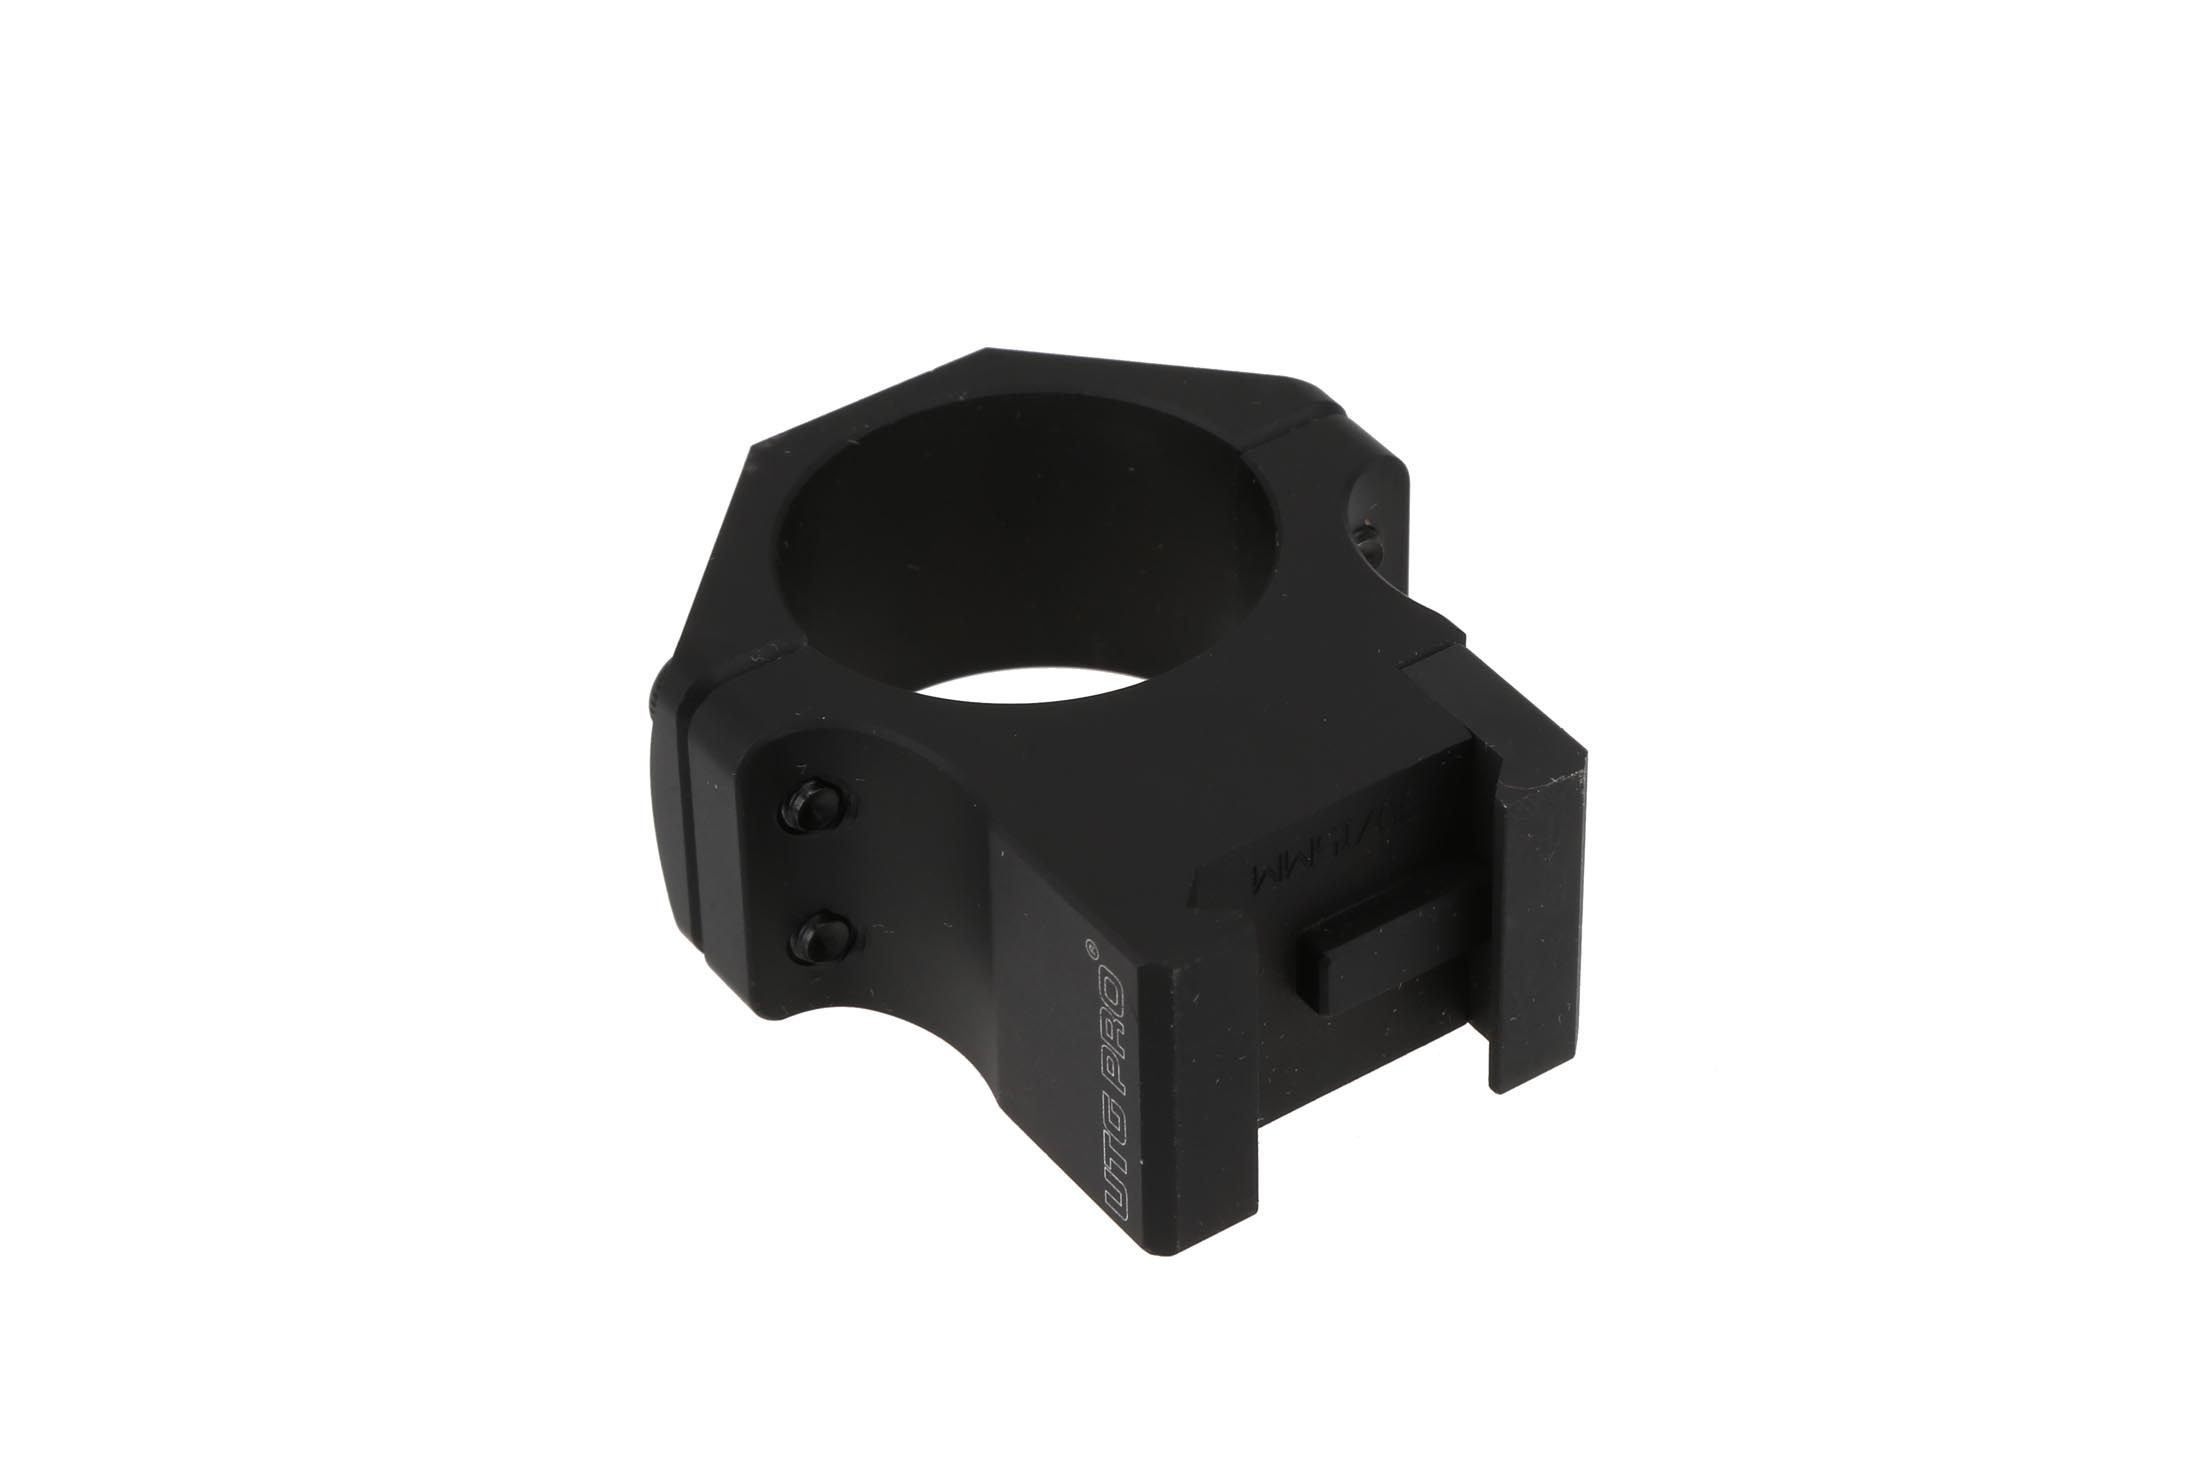 Leapers UTG PRO P O I  30mm Picatinny Scope Rings - Medium Height